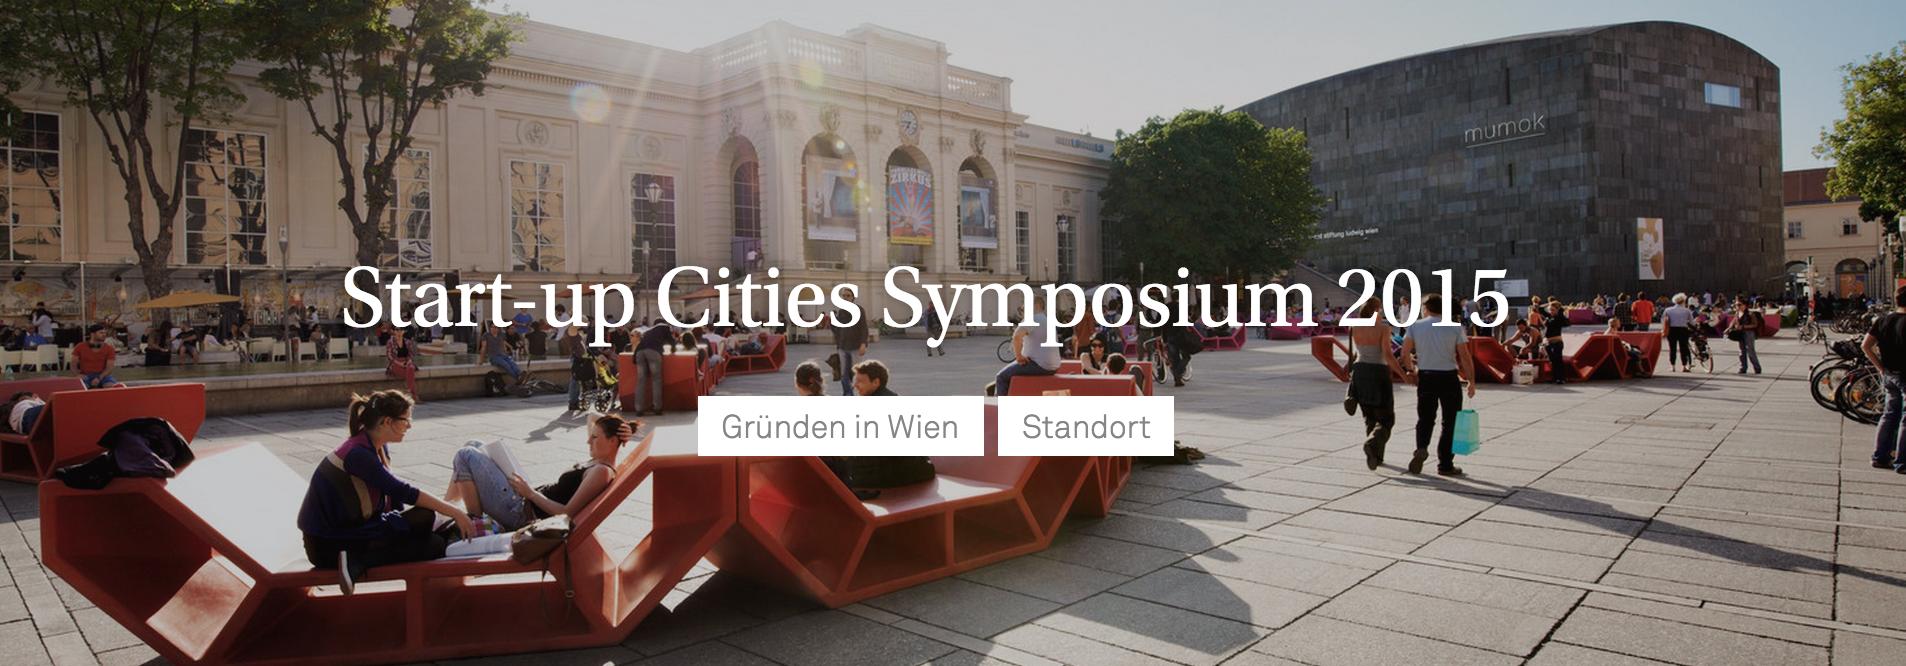 Startup cities symposium